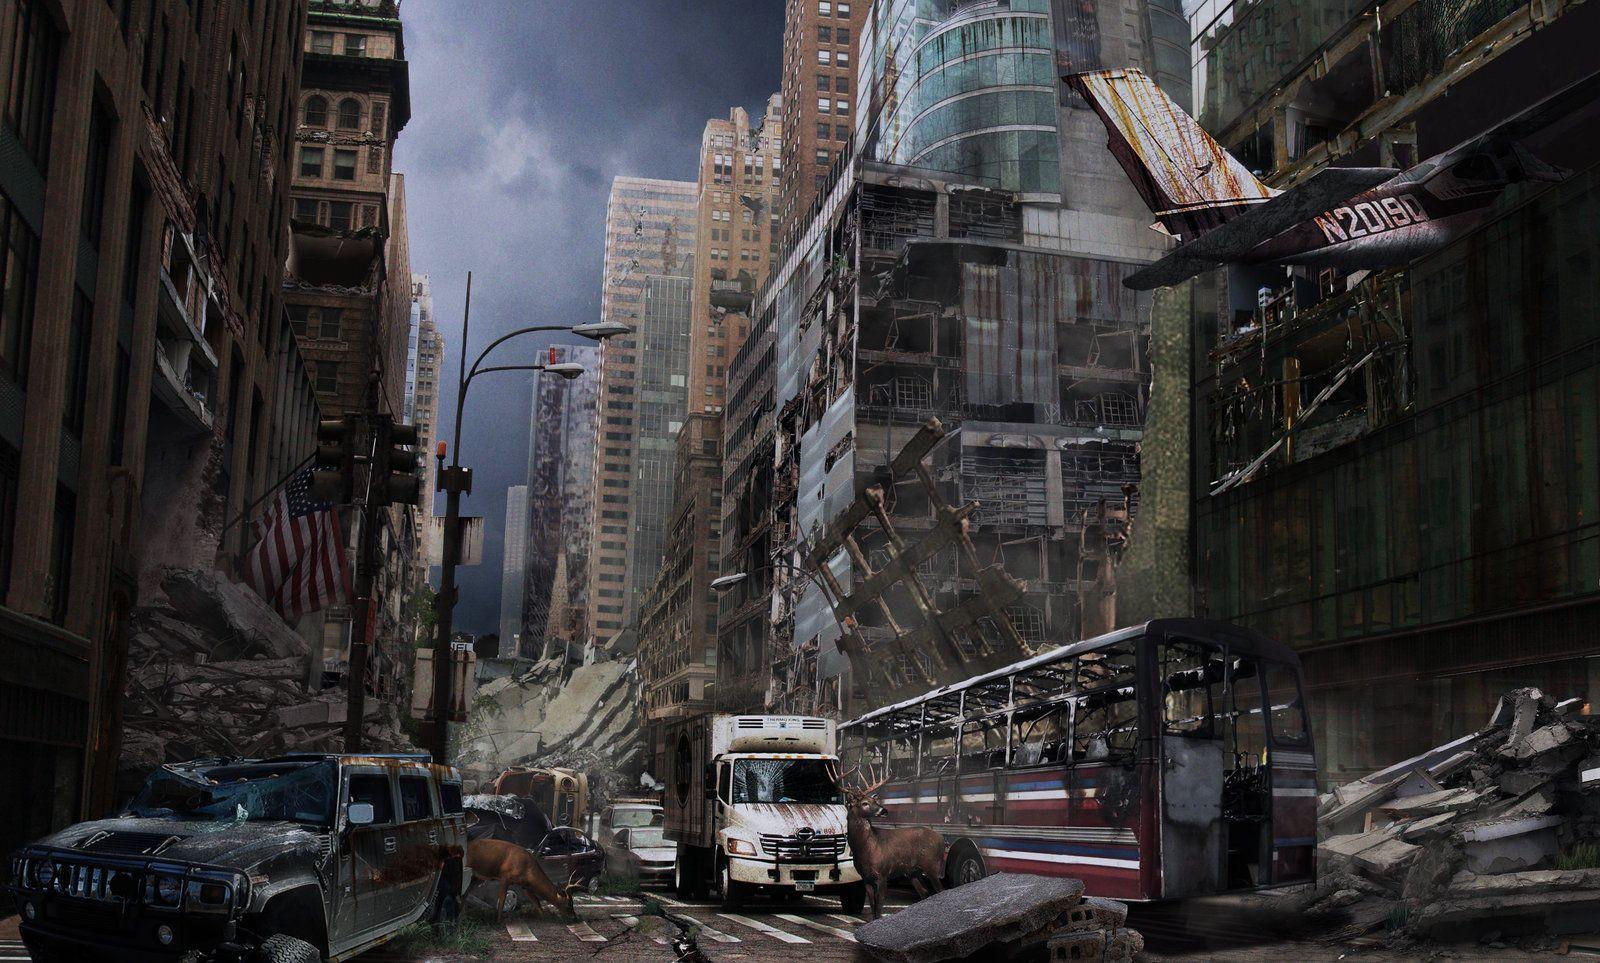 Post Apocalyptic City By Graffiti Freak On Deviantart Post Apocalyptic City Apocalyptic Post Apocalyptic Art